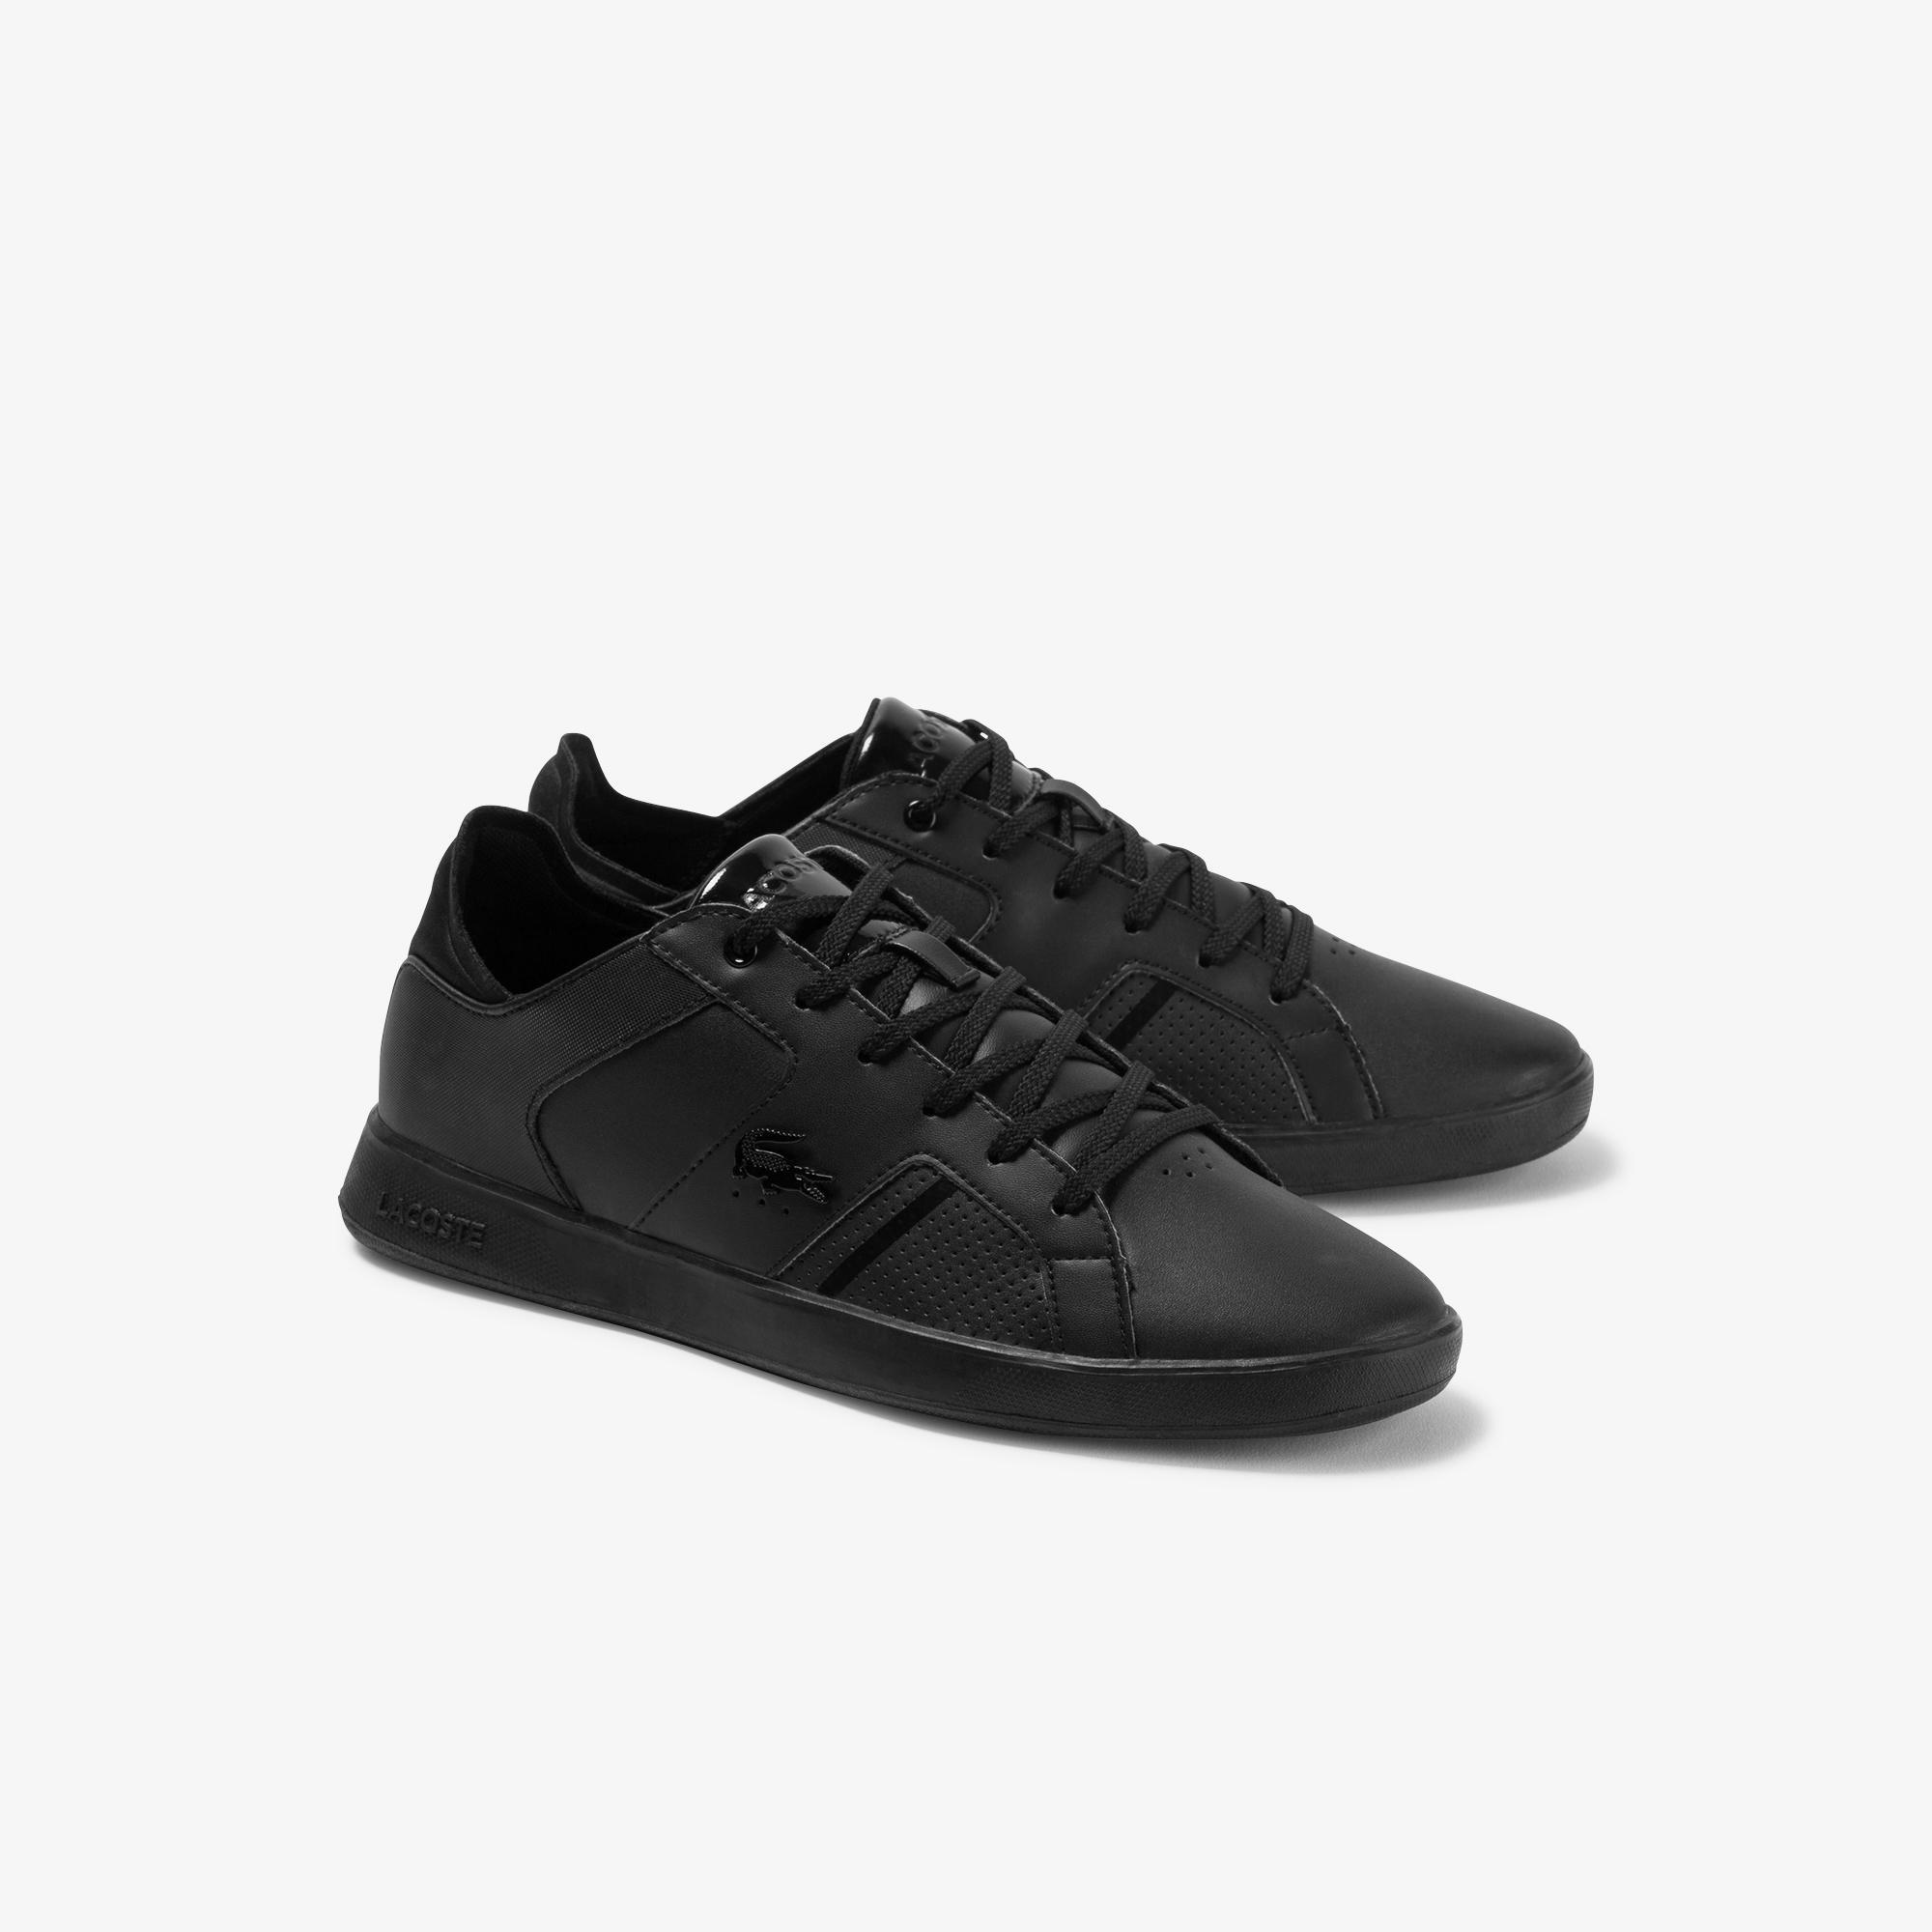 Lacoste Novas 120 3 Sma Erkek Siyah Deri Sneaker